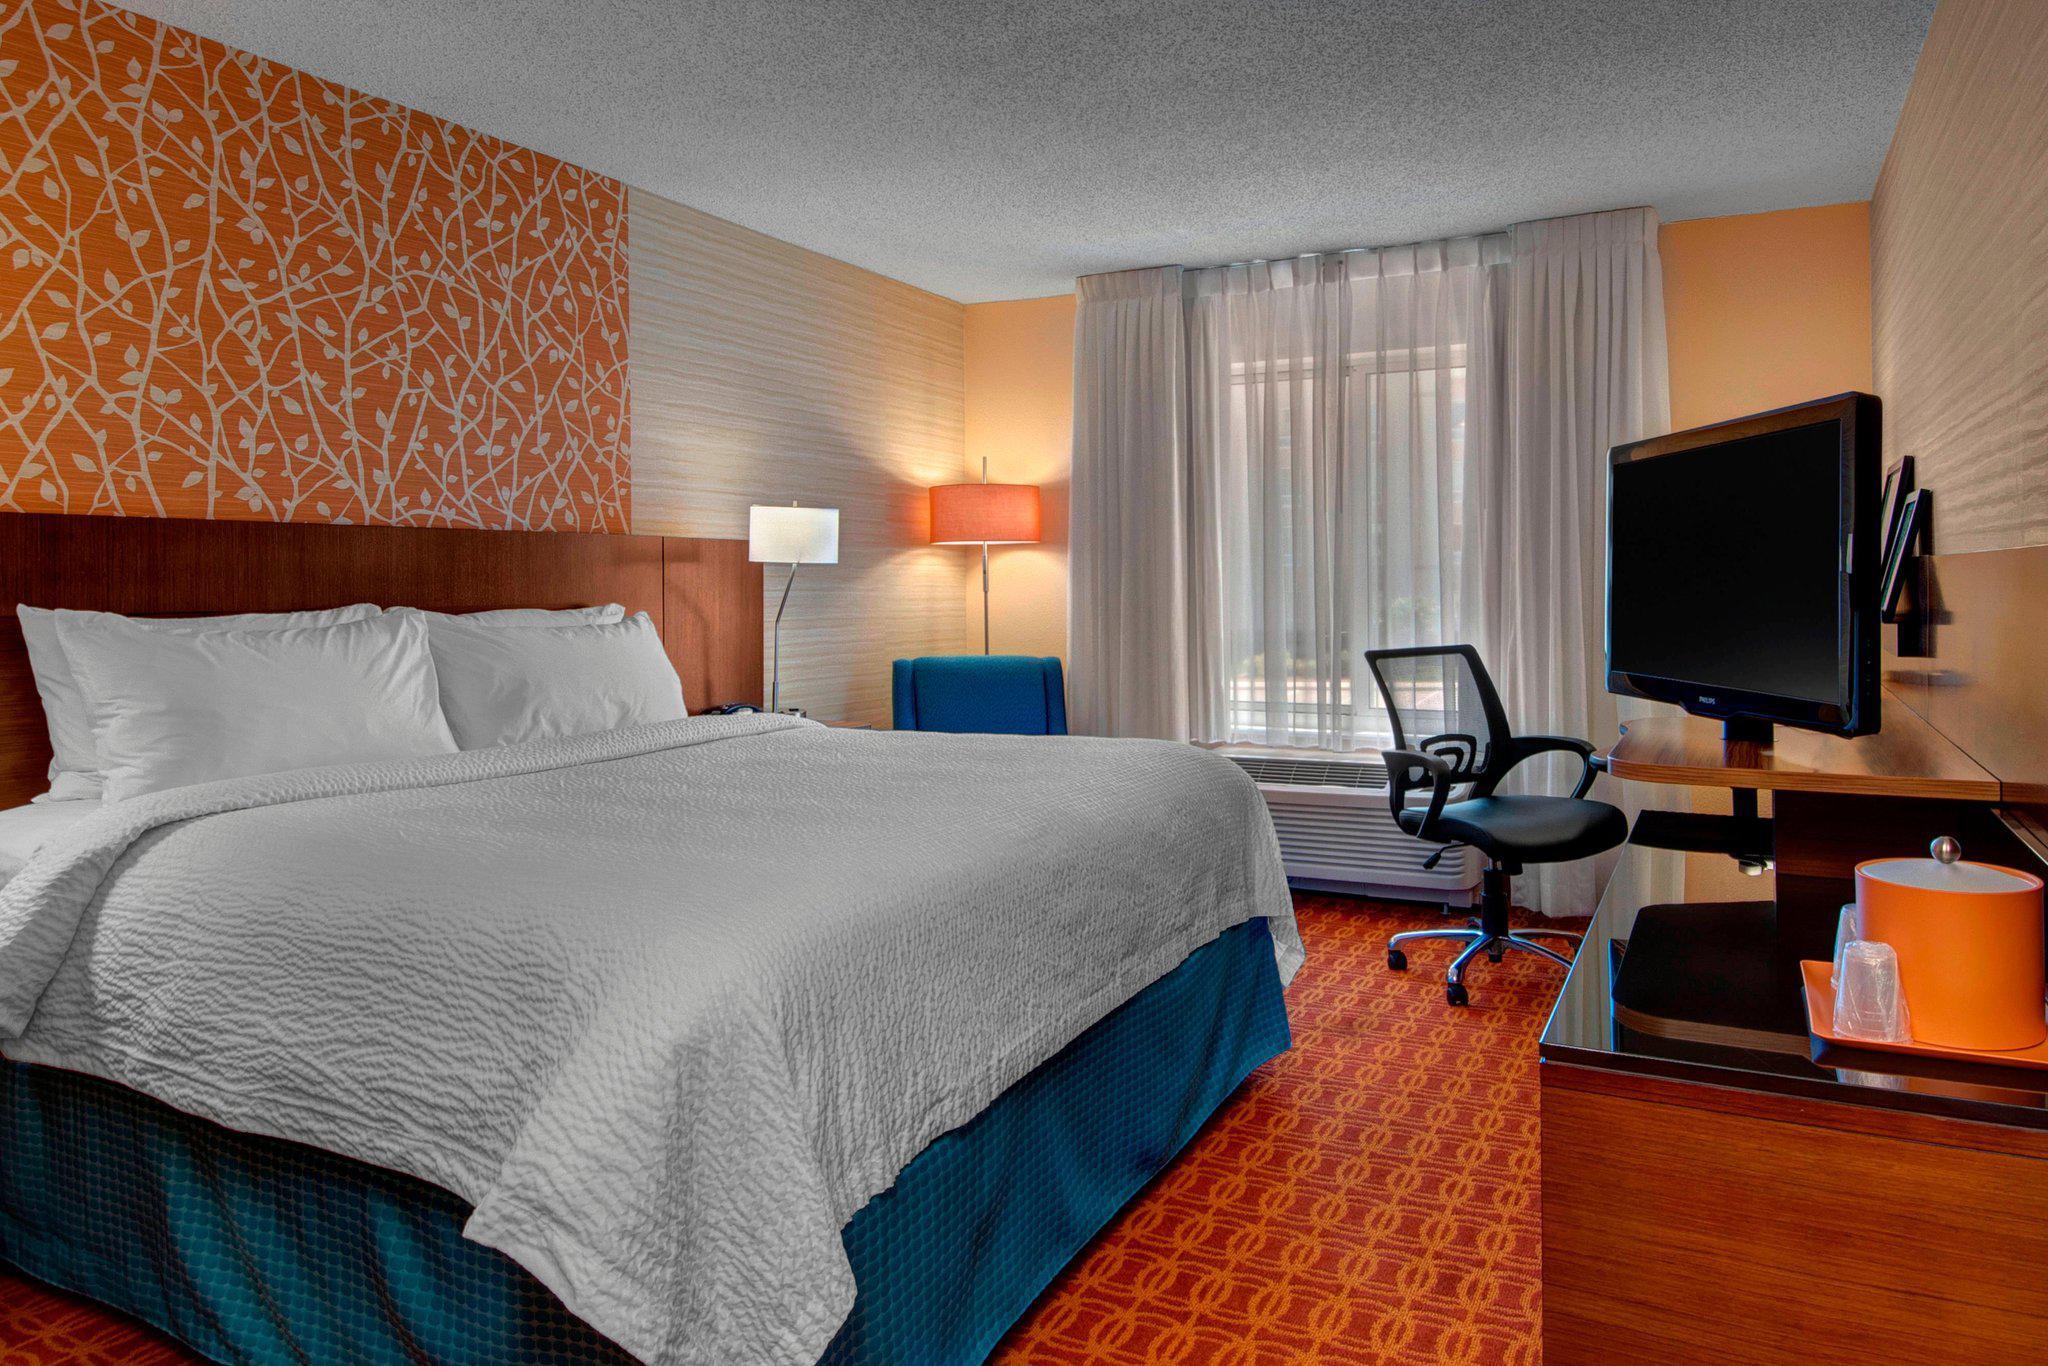 Fairfield Inn & Suites by Marriott Fort Worth I-30 West Near NAS JRB